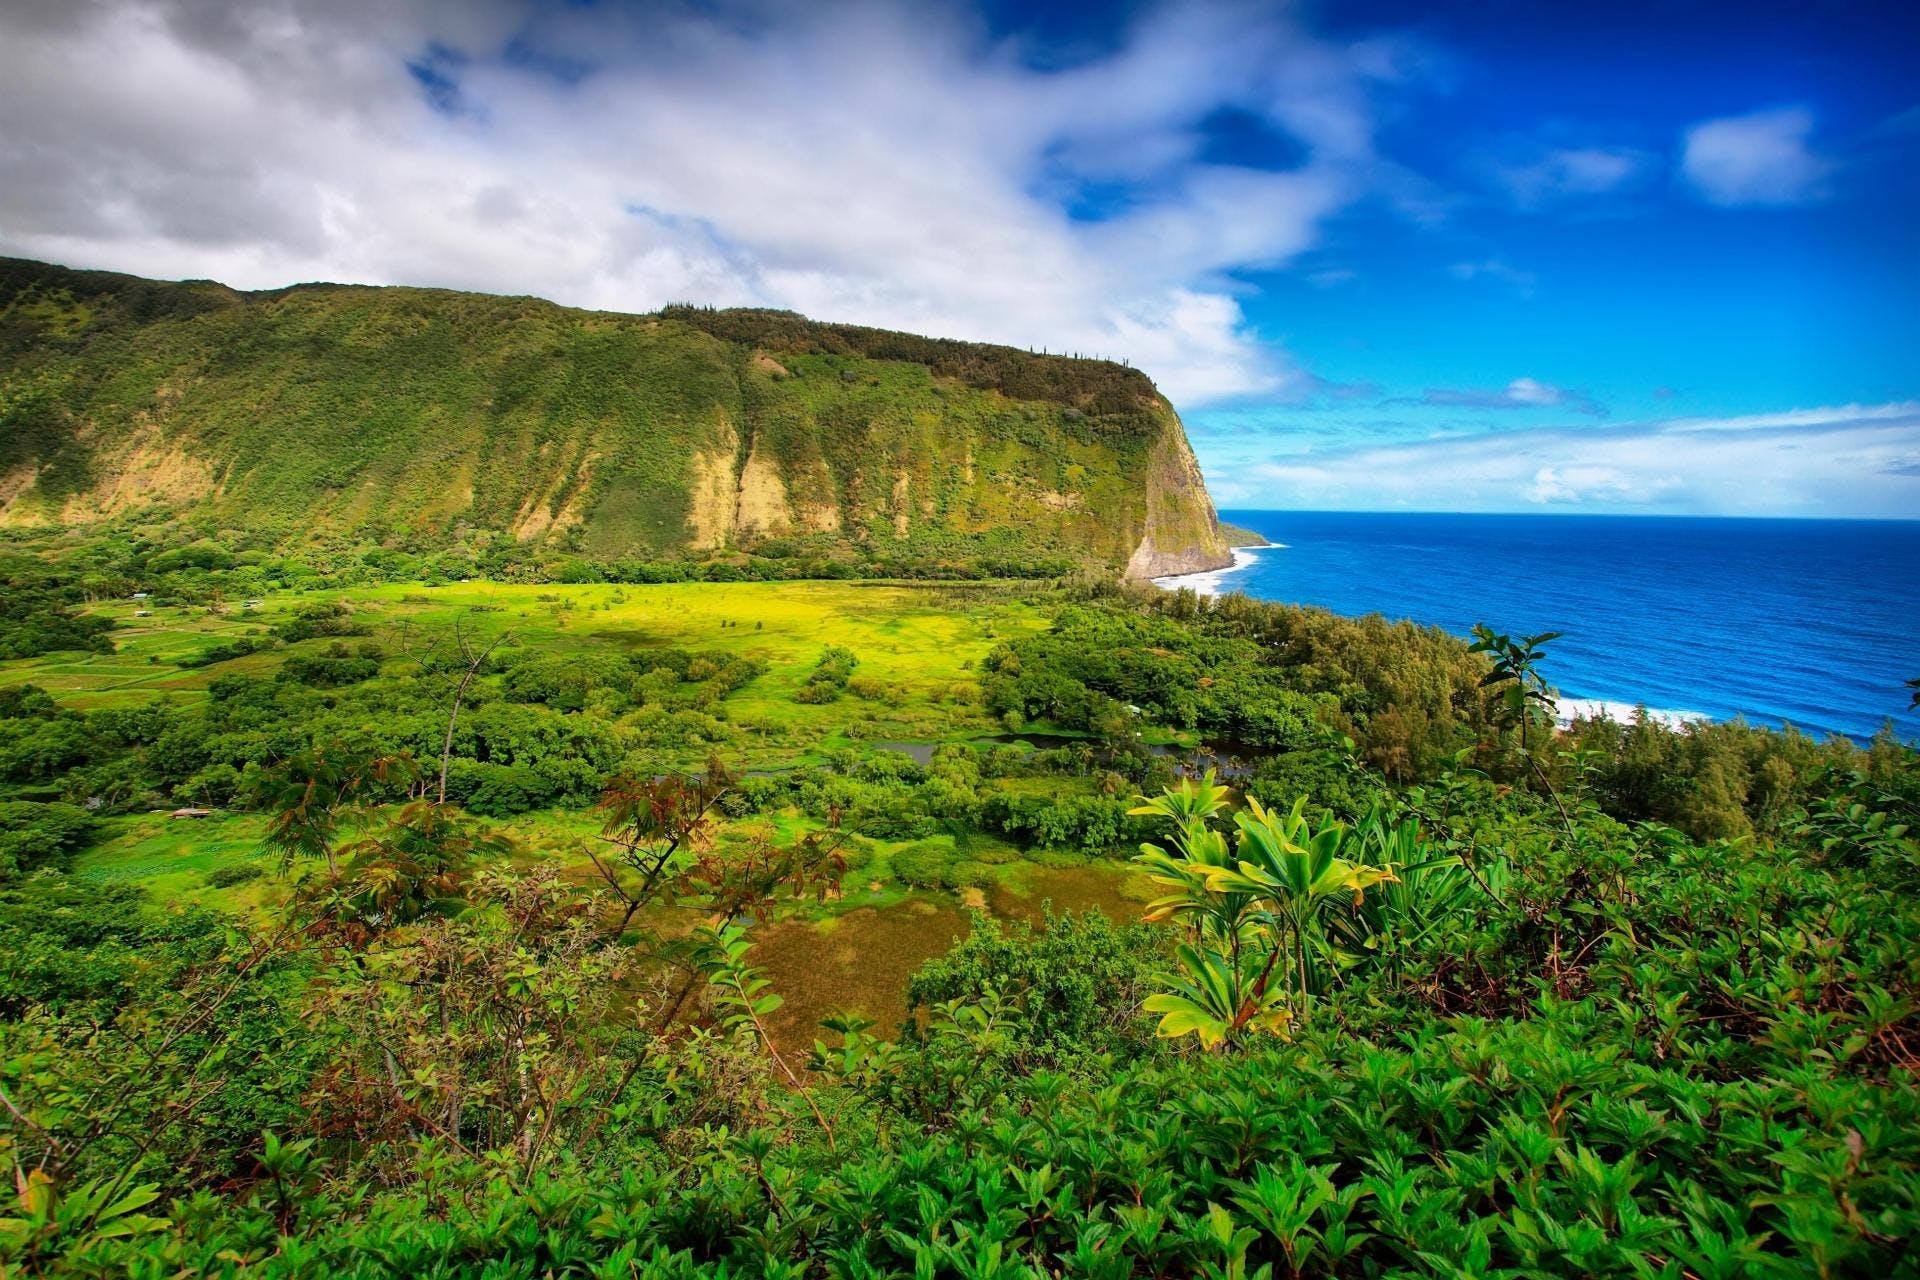 Hawaii Speed datant